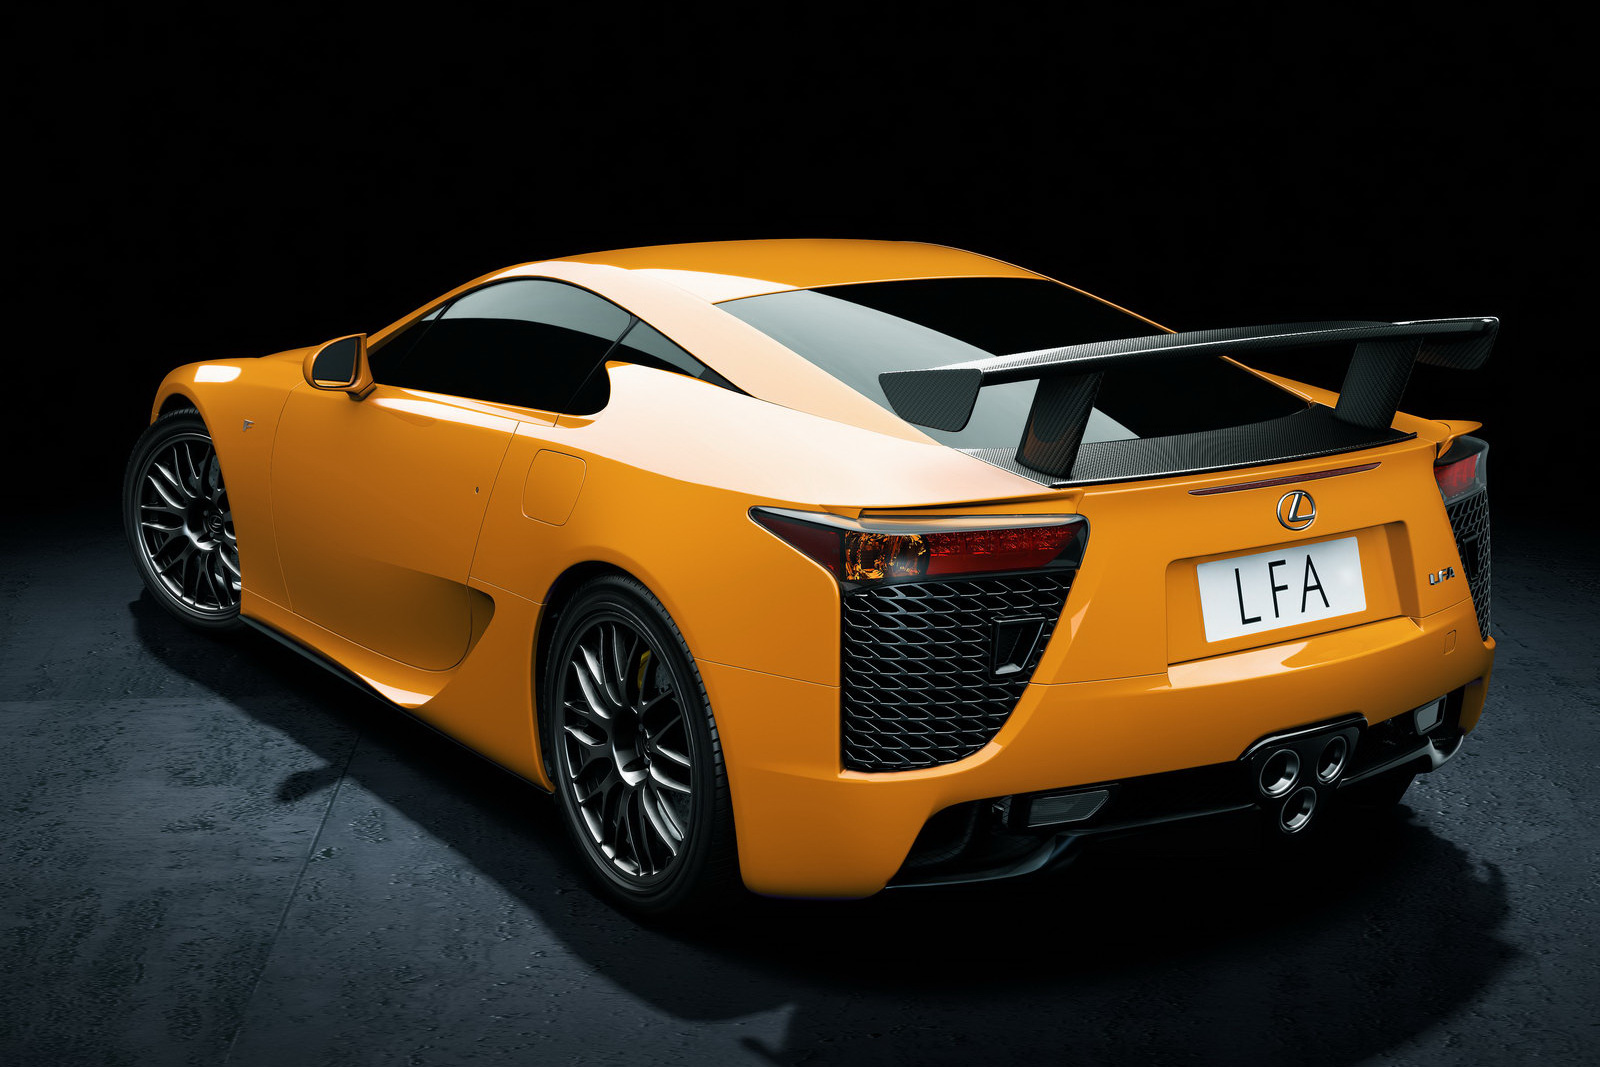 Lexus Prices N rburgring Package for LFA Supercar at 70000 – Lfa Engine Diagram